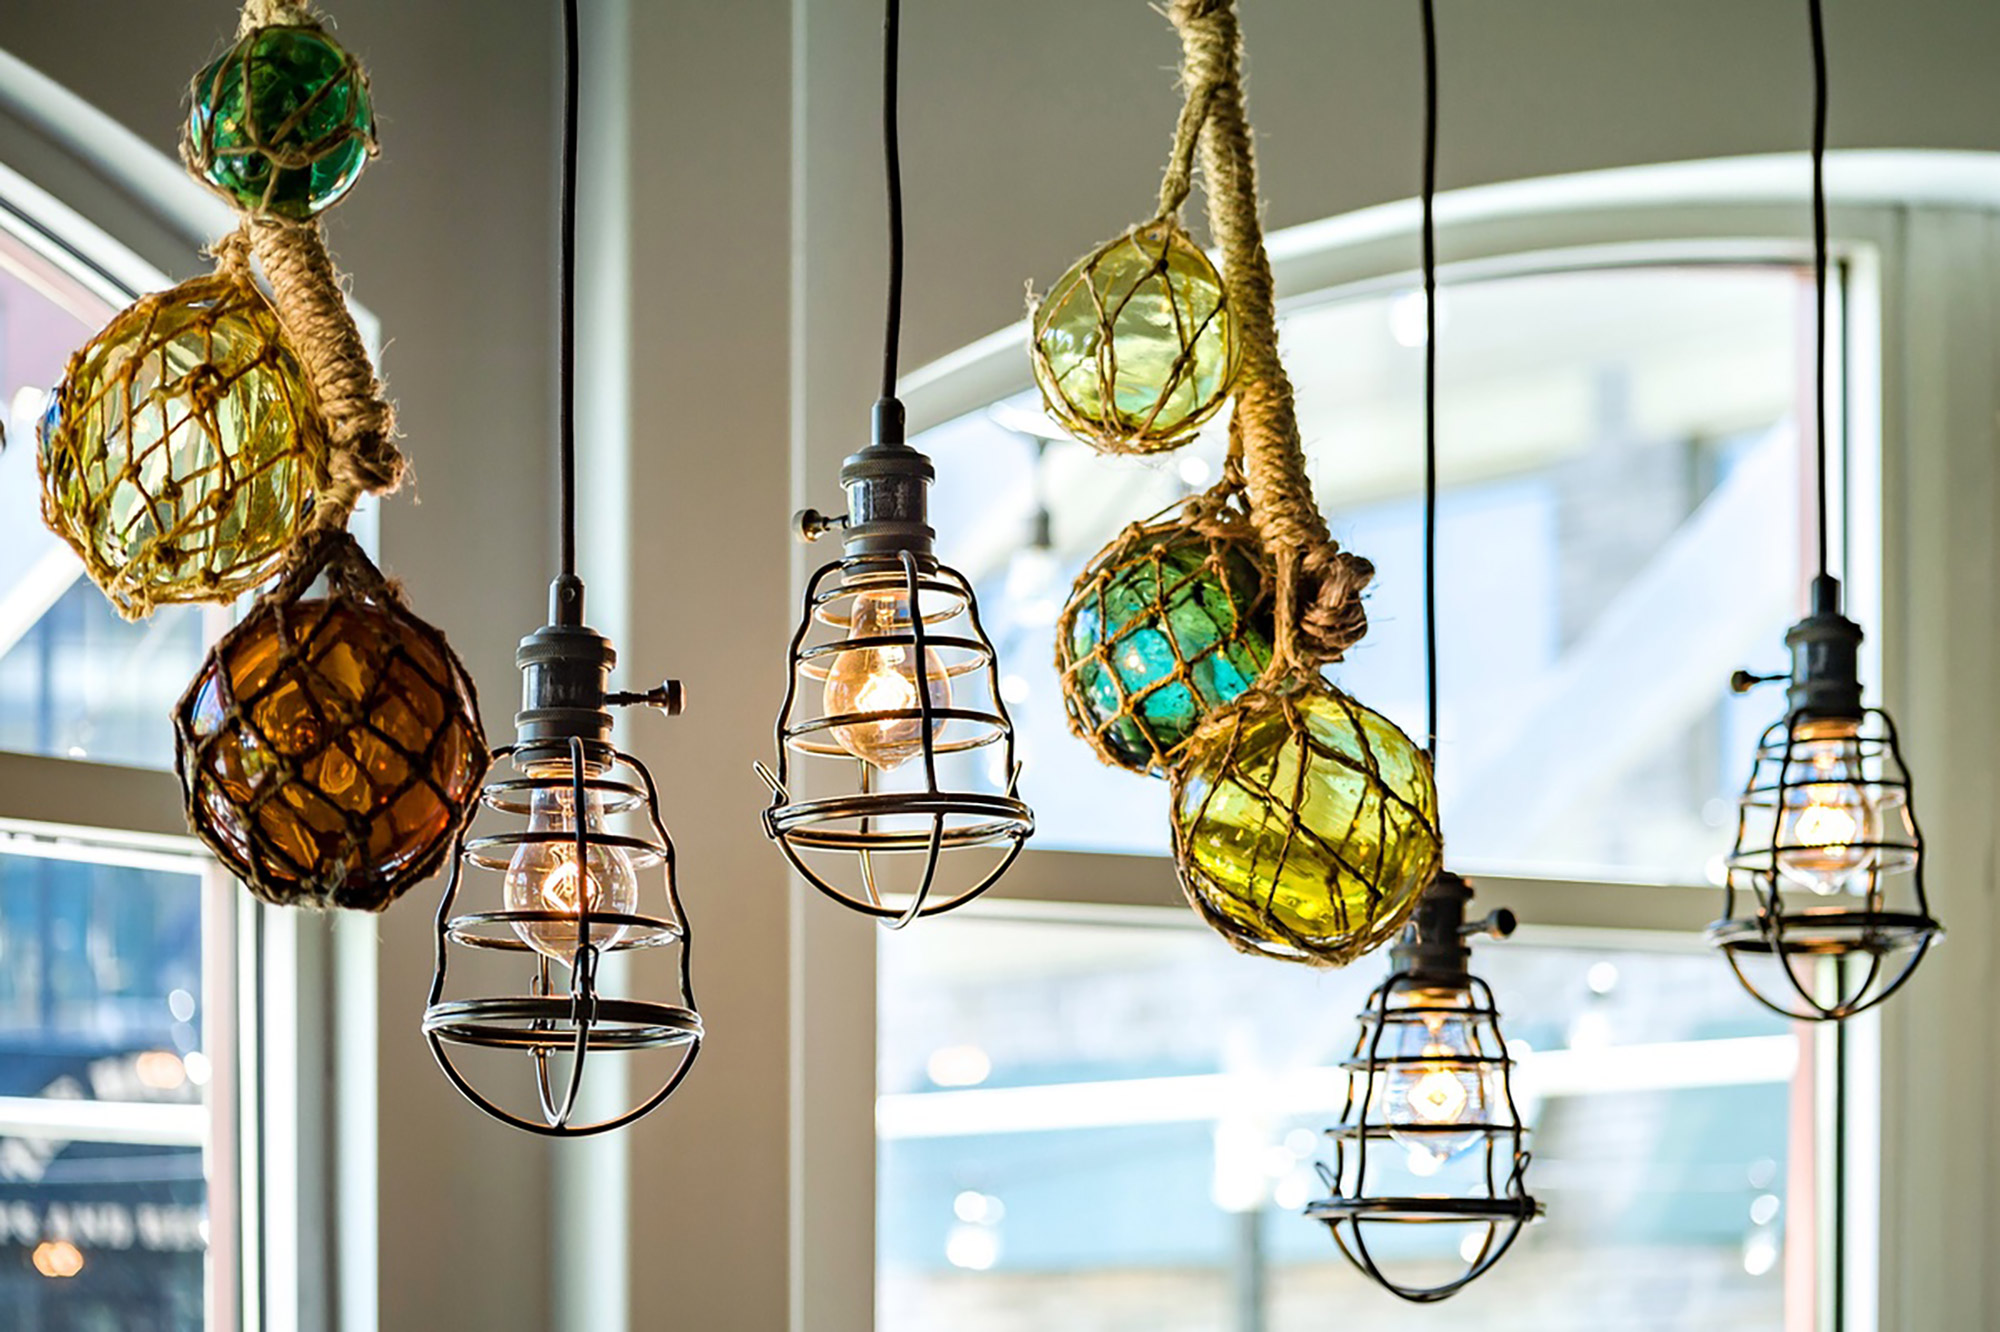 interior-design-seafood-restuarant-lighting.jpg